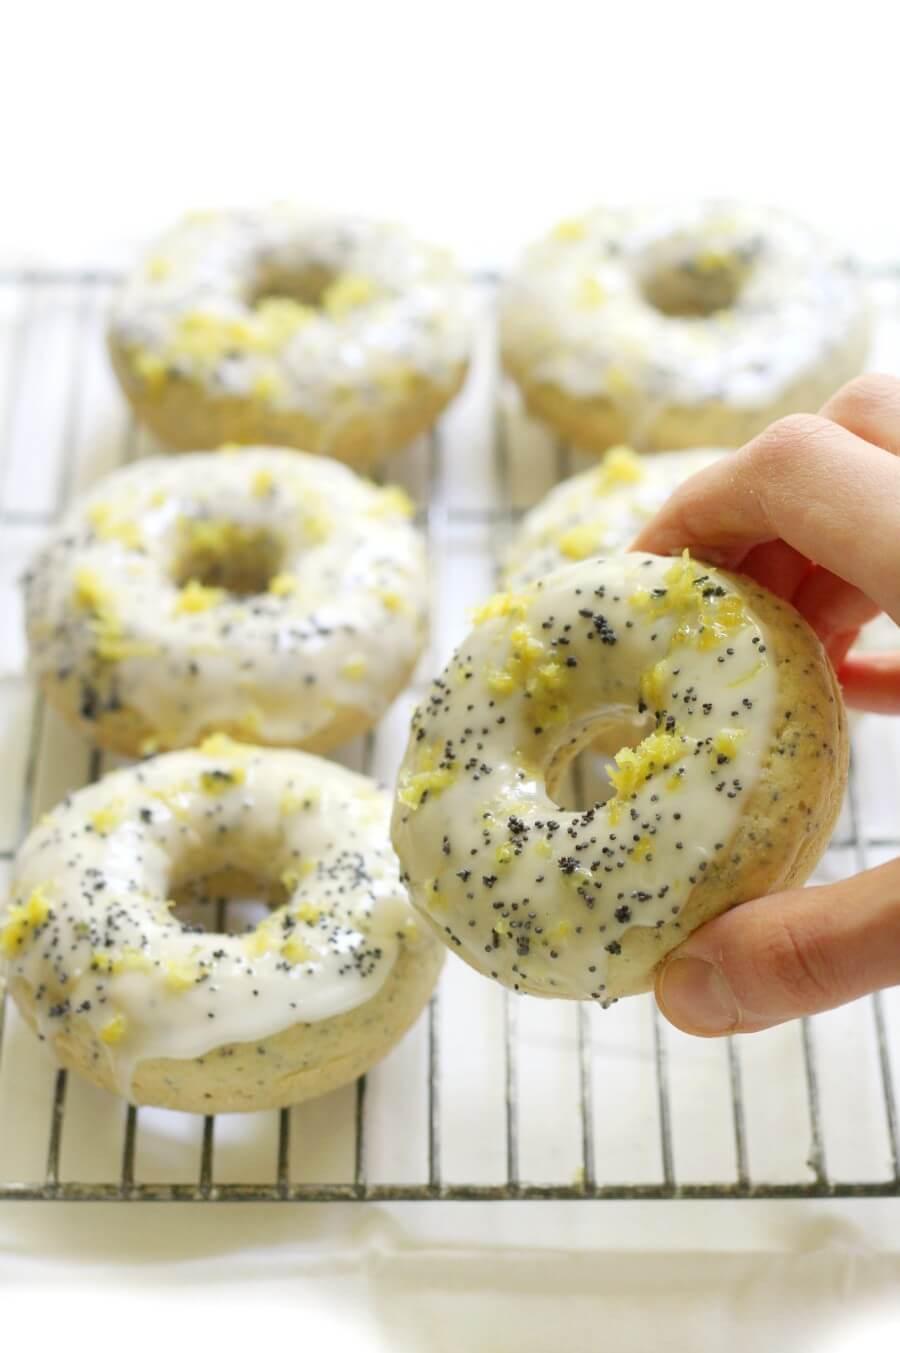 hand grabbing a glazed gluten-free lemon poppy seed doughnuts